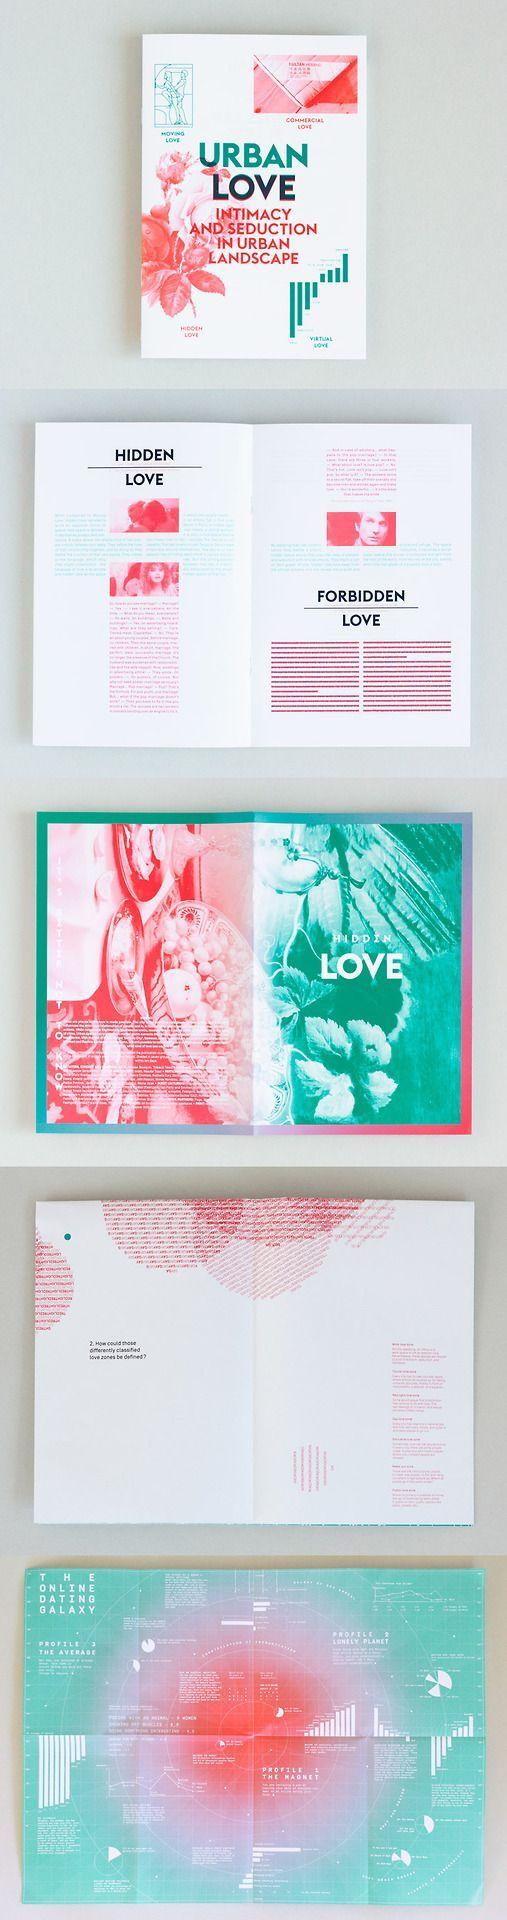 Aproveitar a paleta de cores também para os elementos textuais